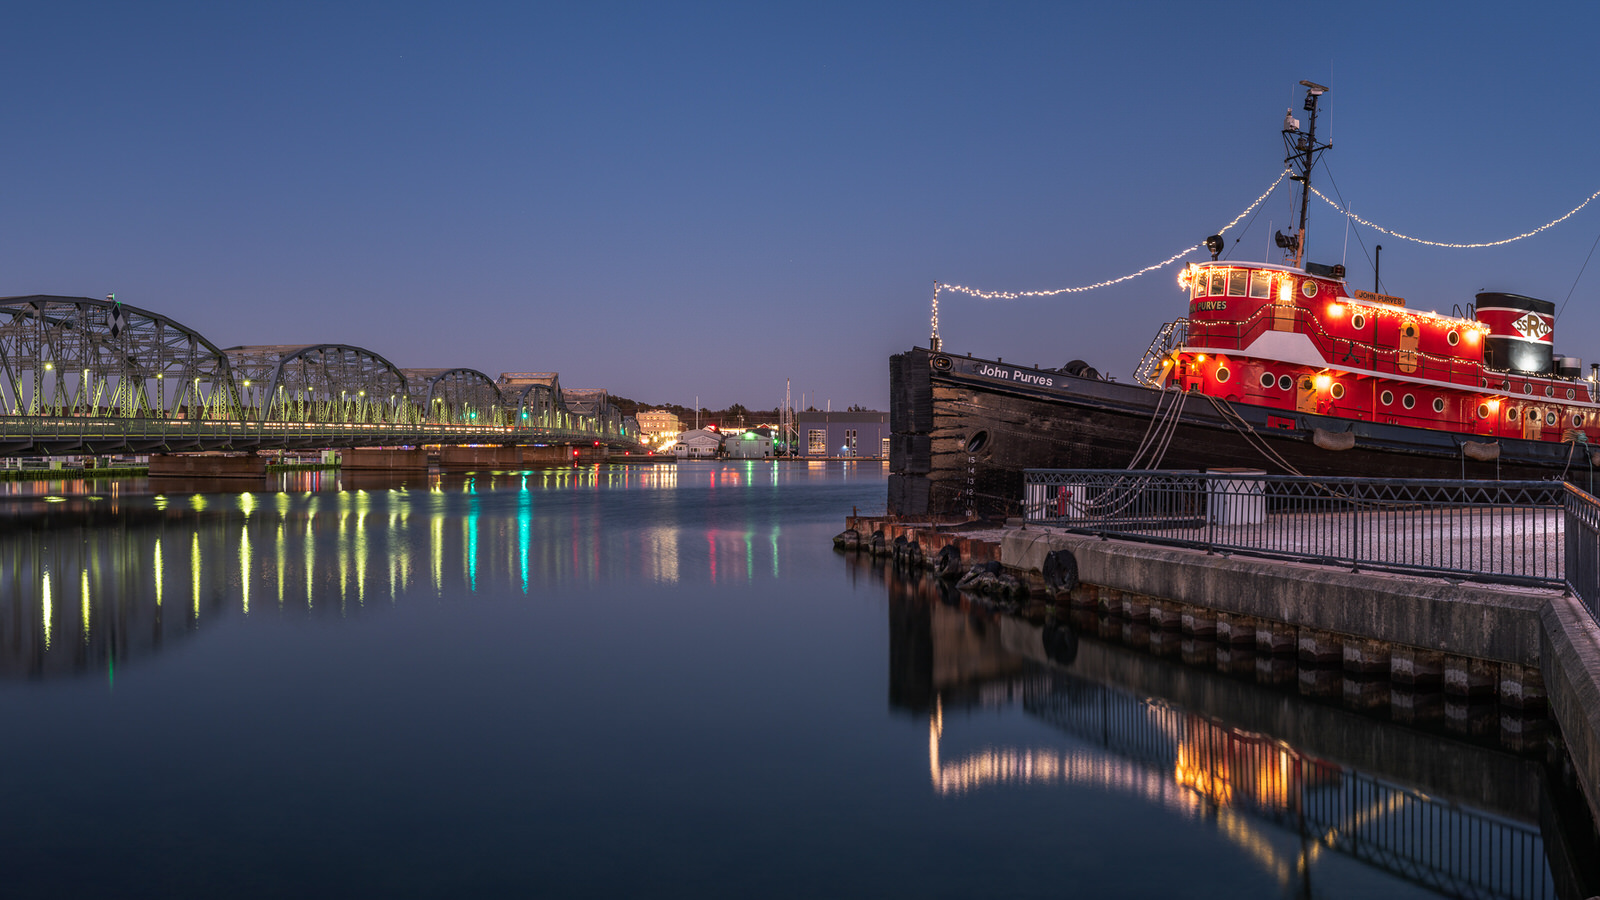 sturgeon Bay, waterfront, door county, wisconsin, tugboat, christmas lights, reflection, night, sturgeon bay christmas